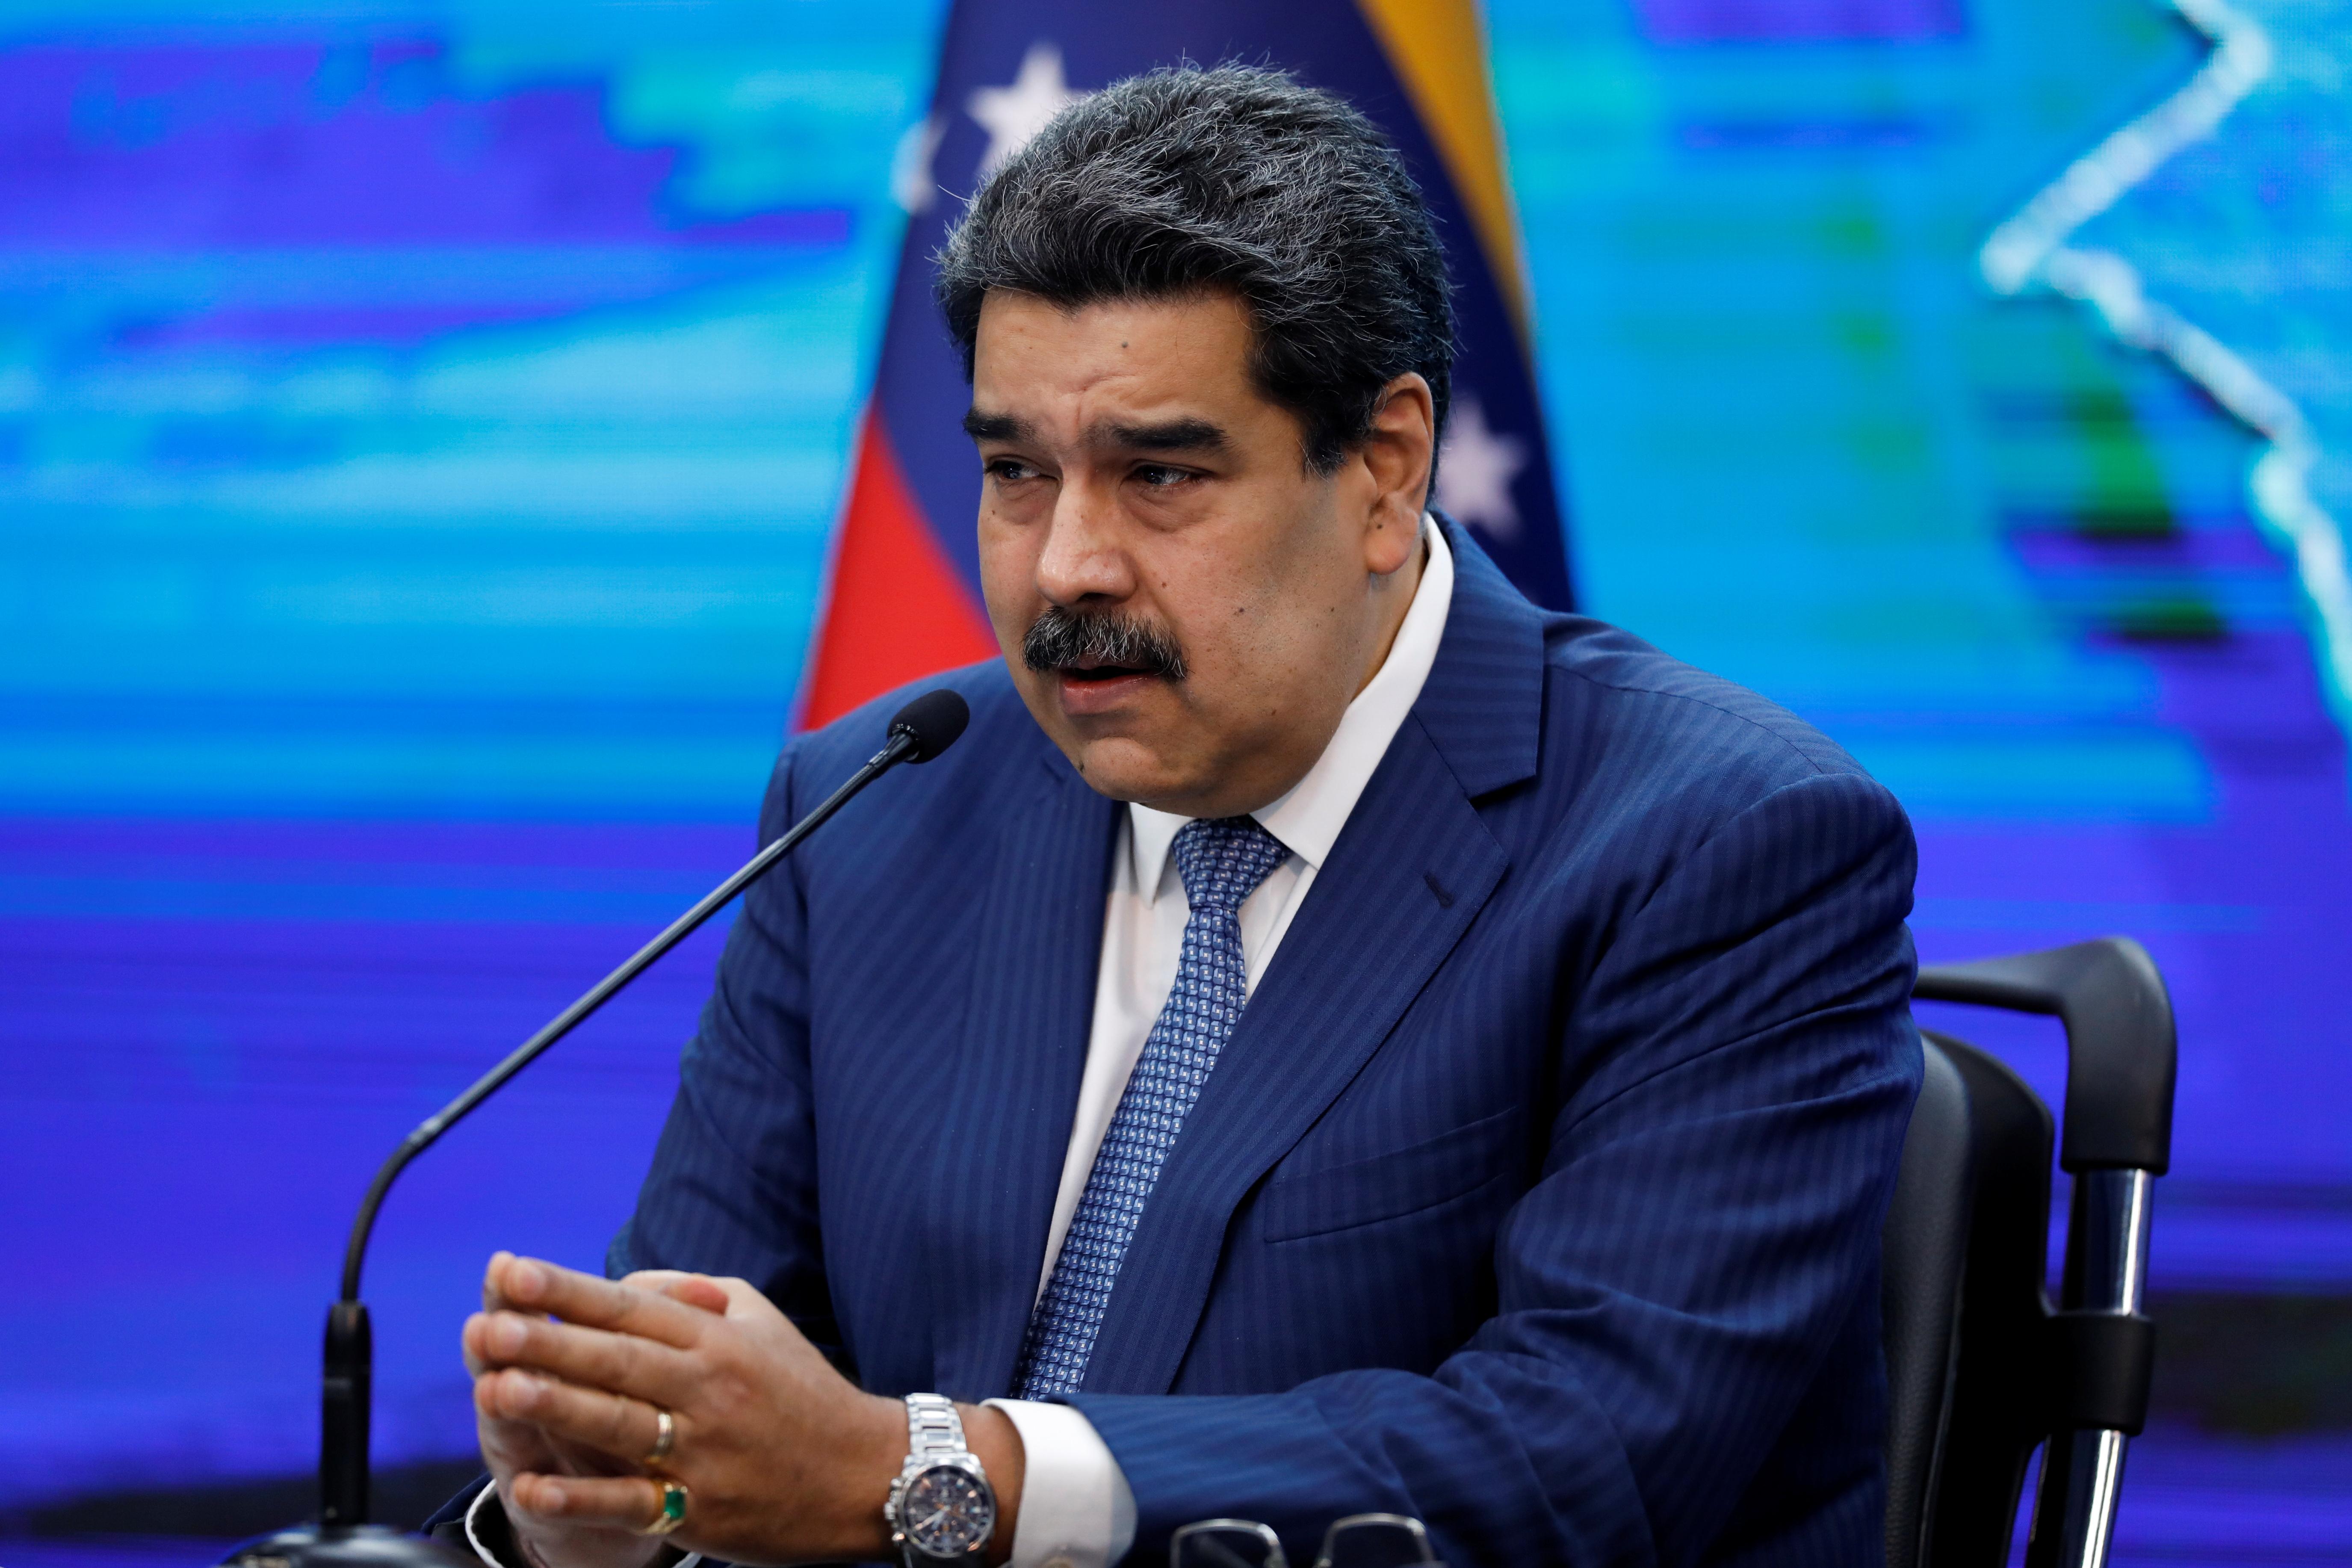 Venezuela's President Nicolas Maduro addresses the media from the Miraflores Palace, in Caracas, Venezuela August 16, 2021. REUTERS/Leonardo Fernandez Viloria